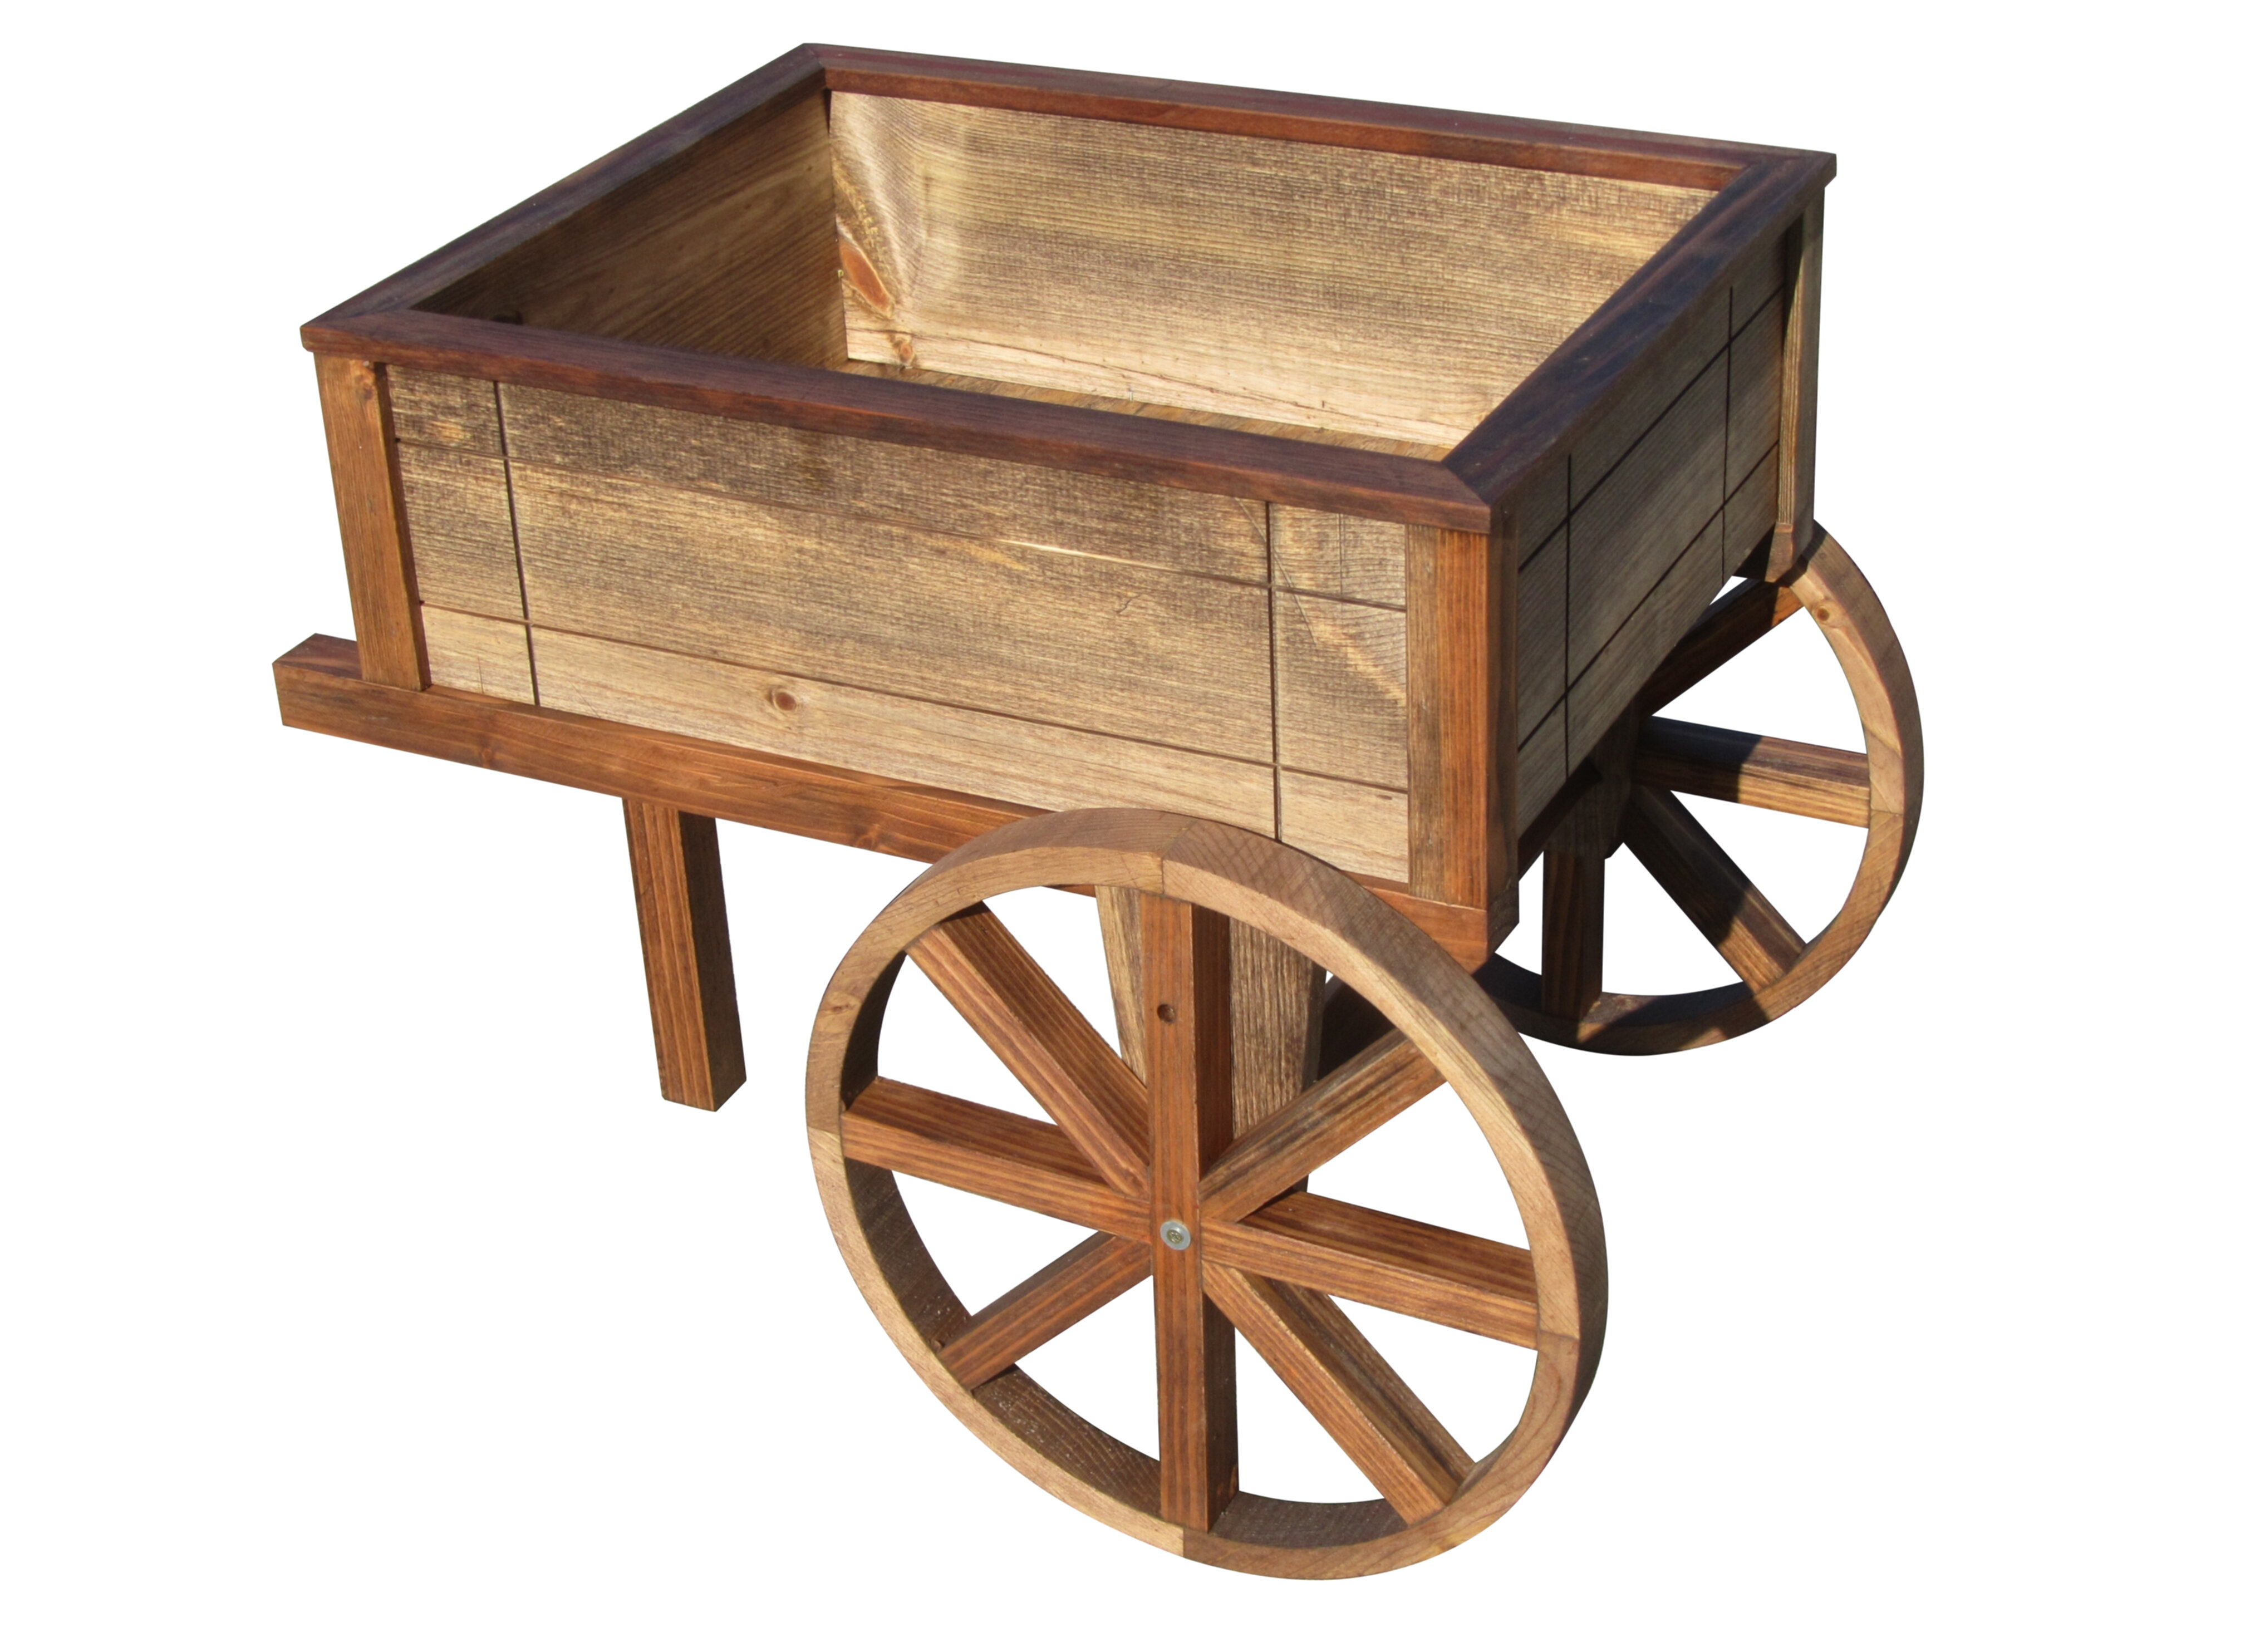 Samsgazebos Wood Wheelbarrow Planter Wayfair